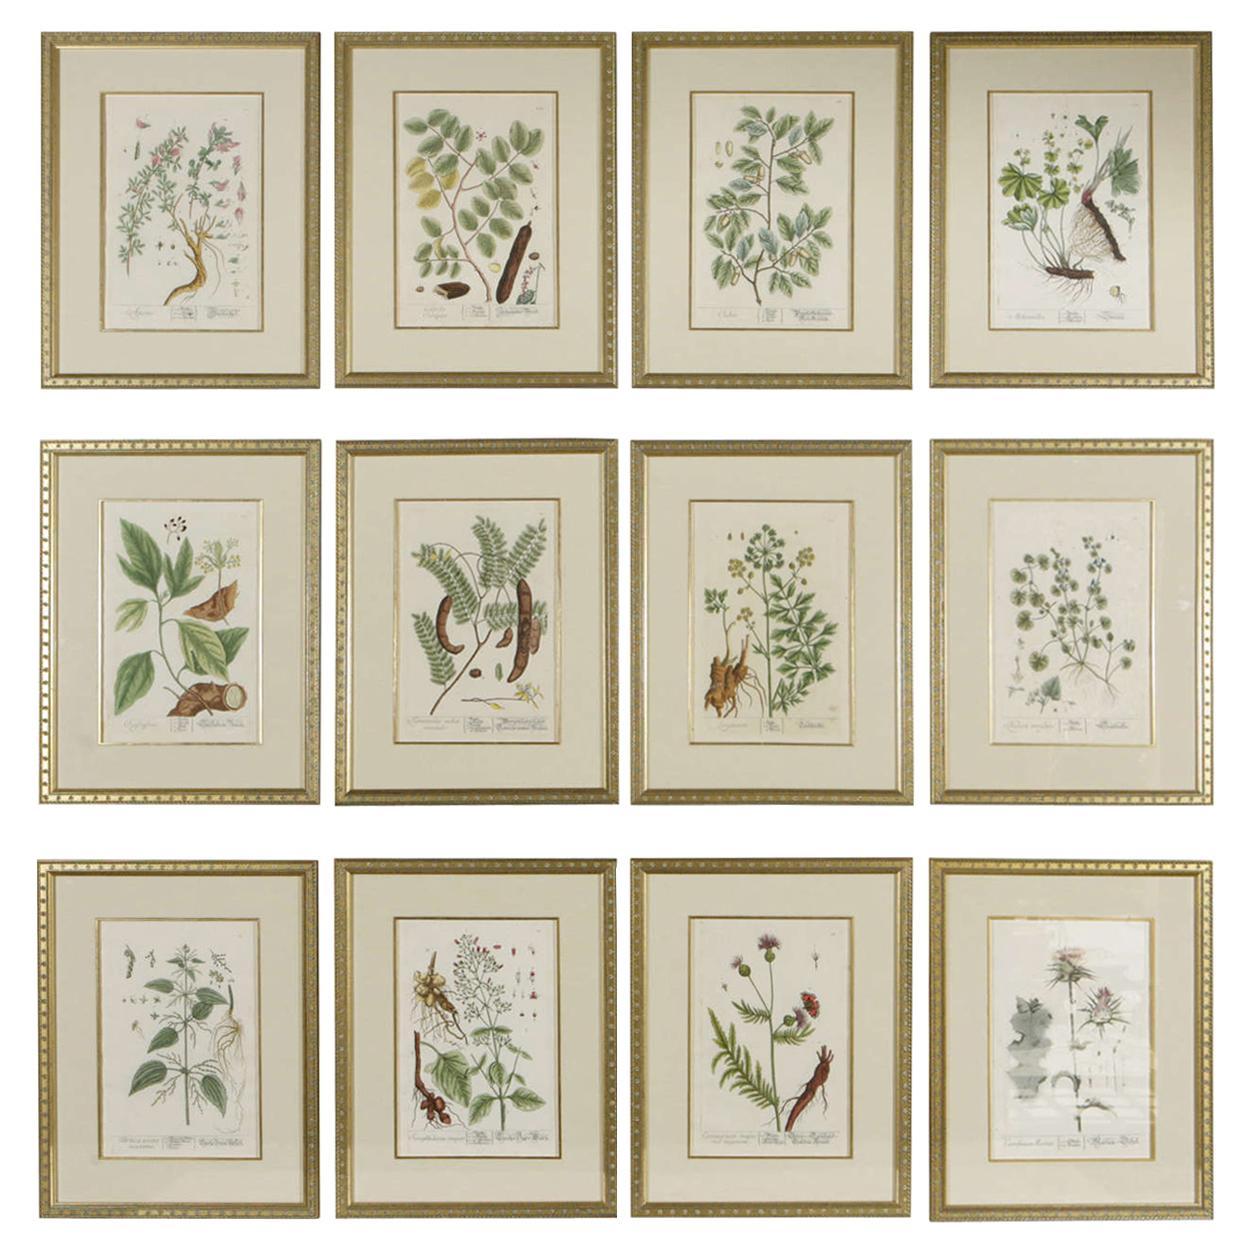 18th Century Framed Botanical Prints